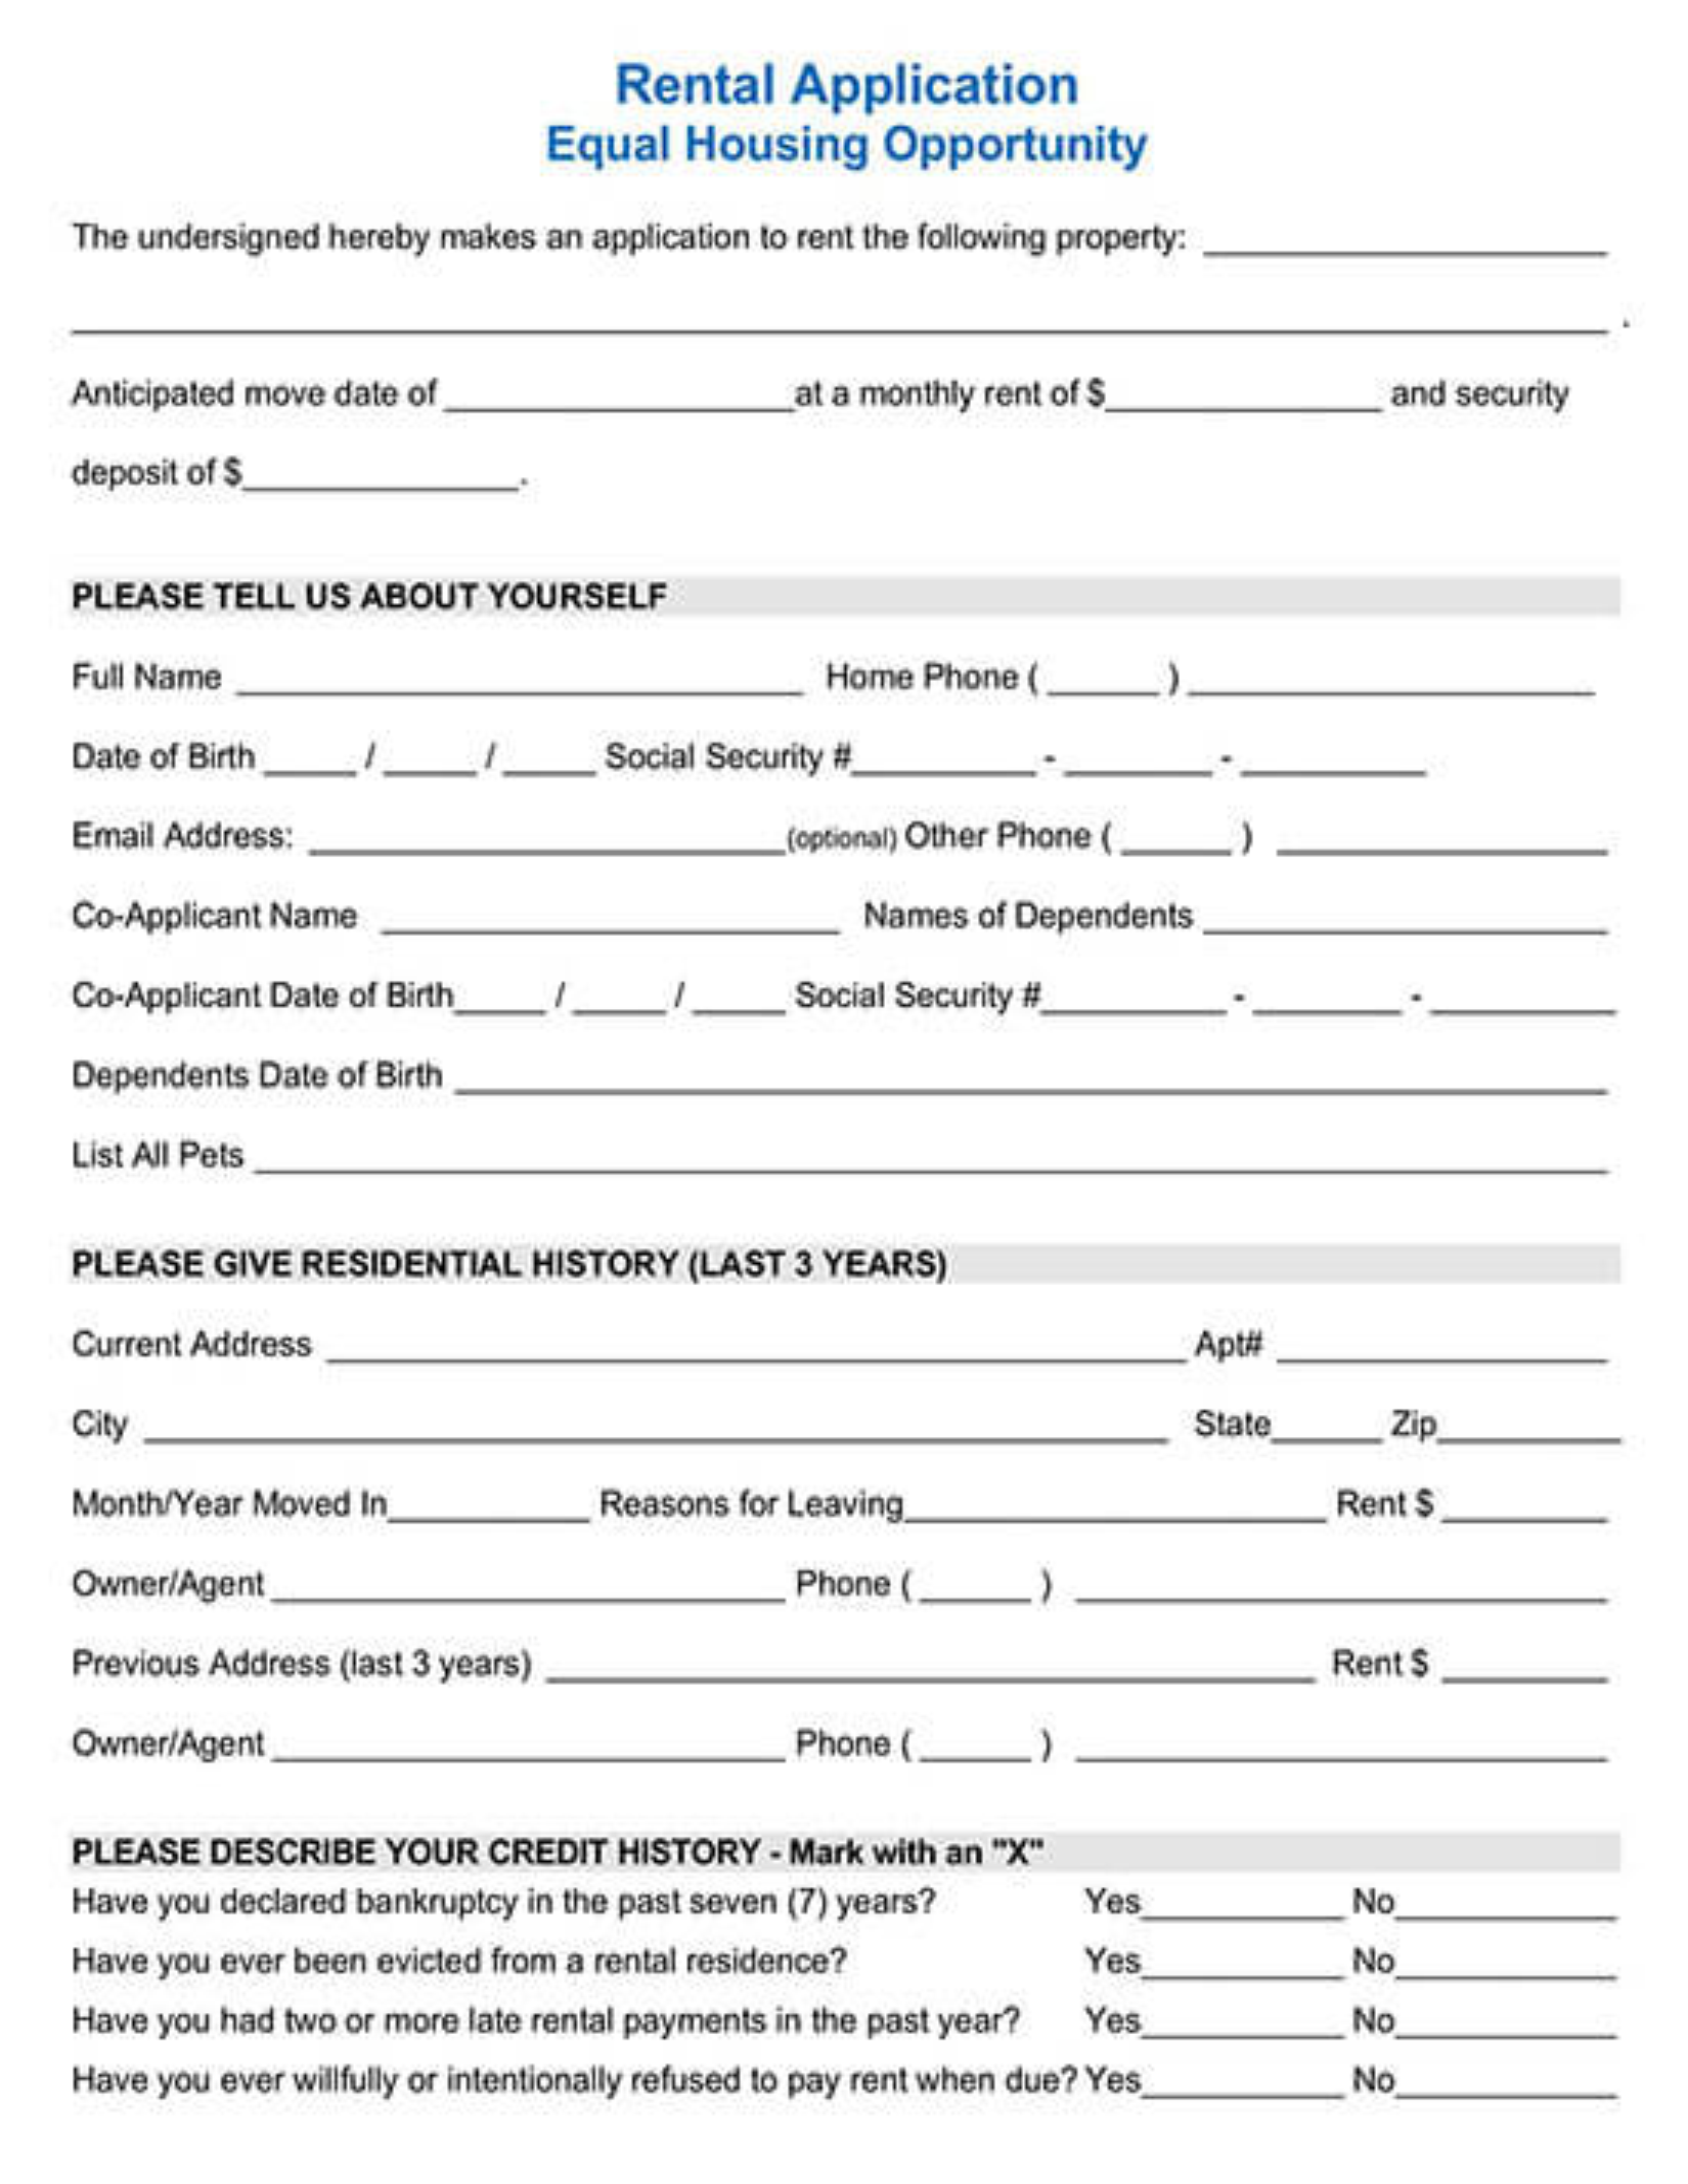 Standard Sample Rental Application